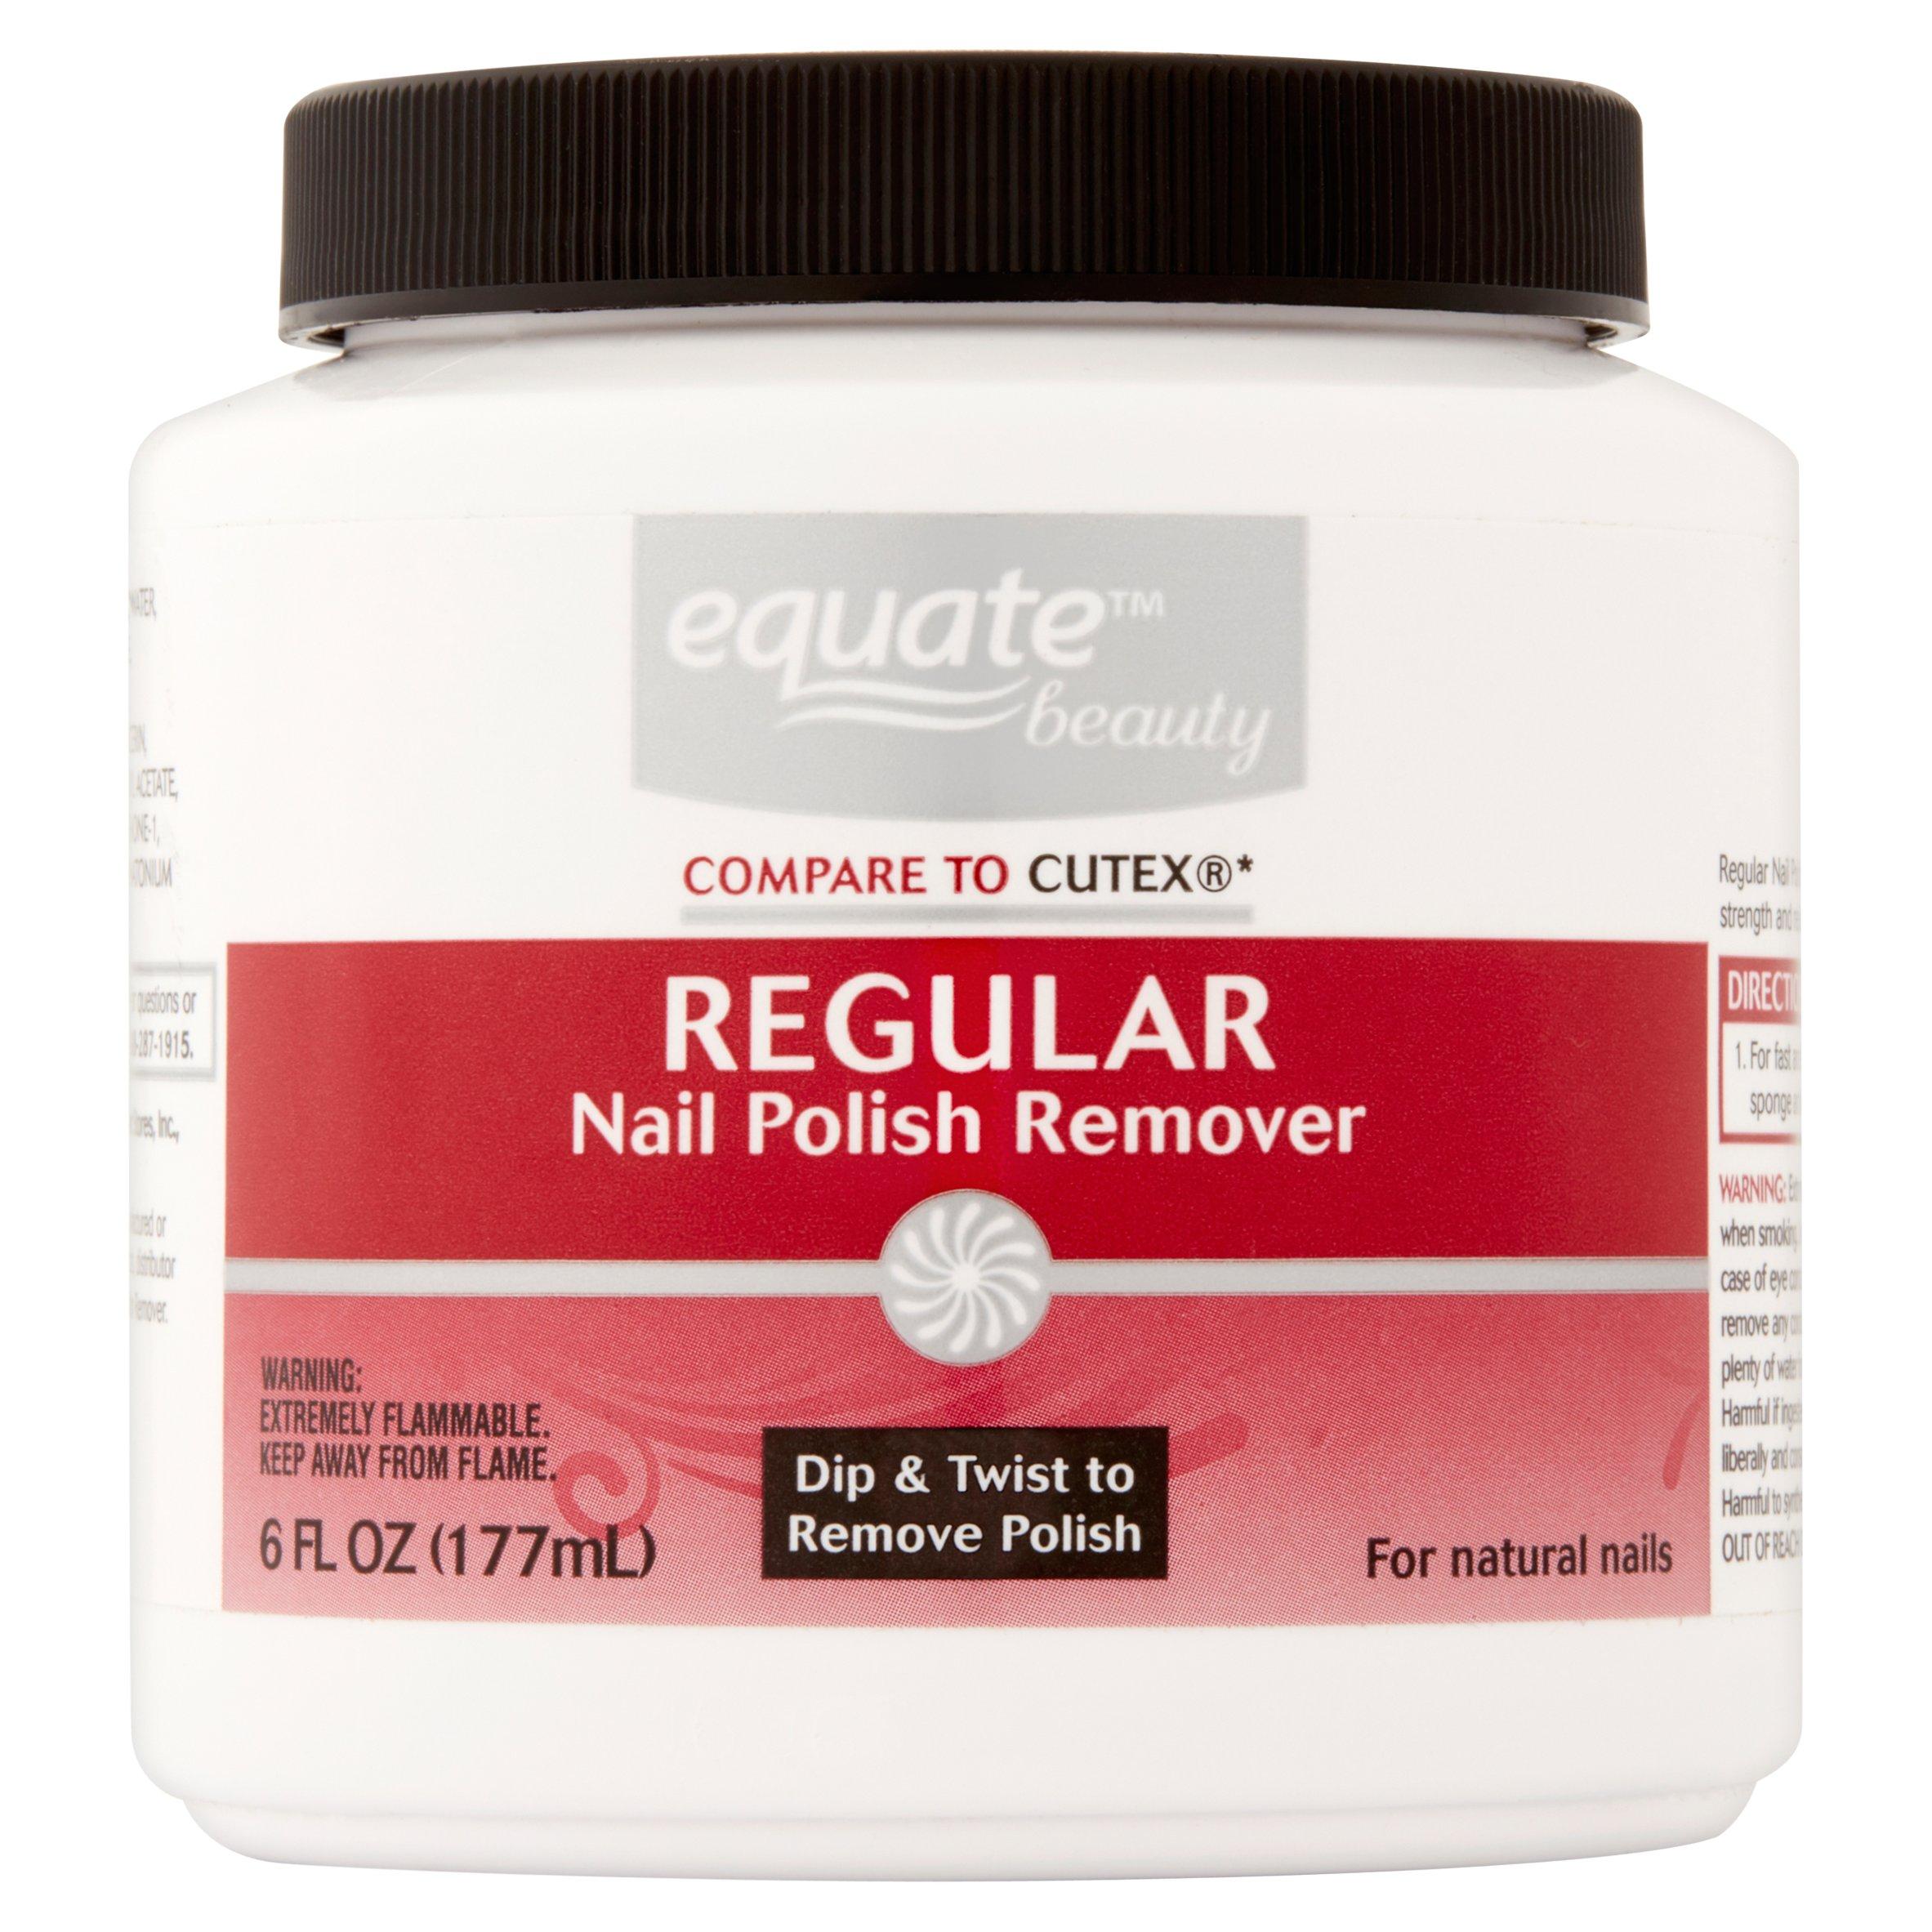 (4 Pack) Equate Beauty Regular Nail Polish Remover, 6 Fl Oz